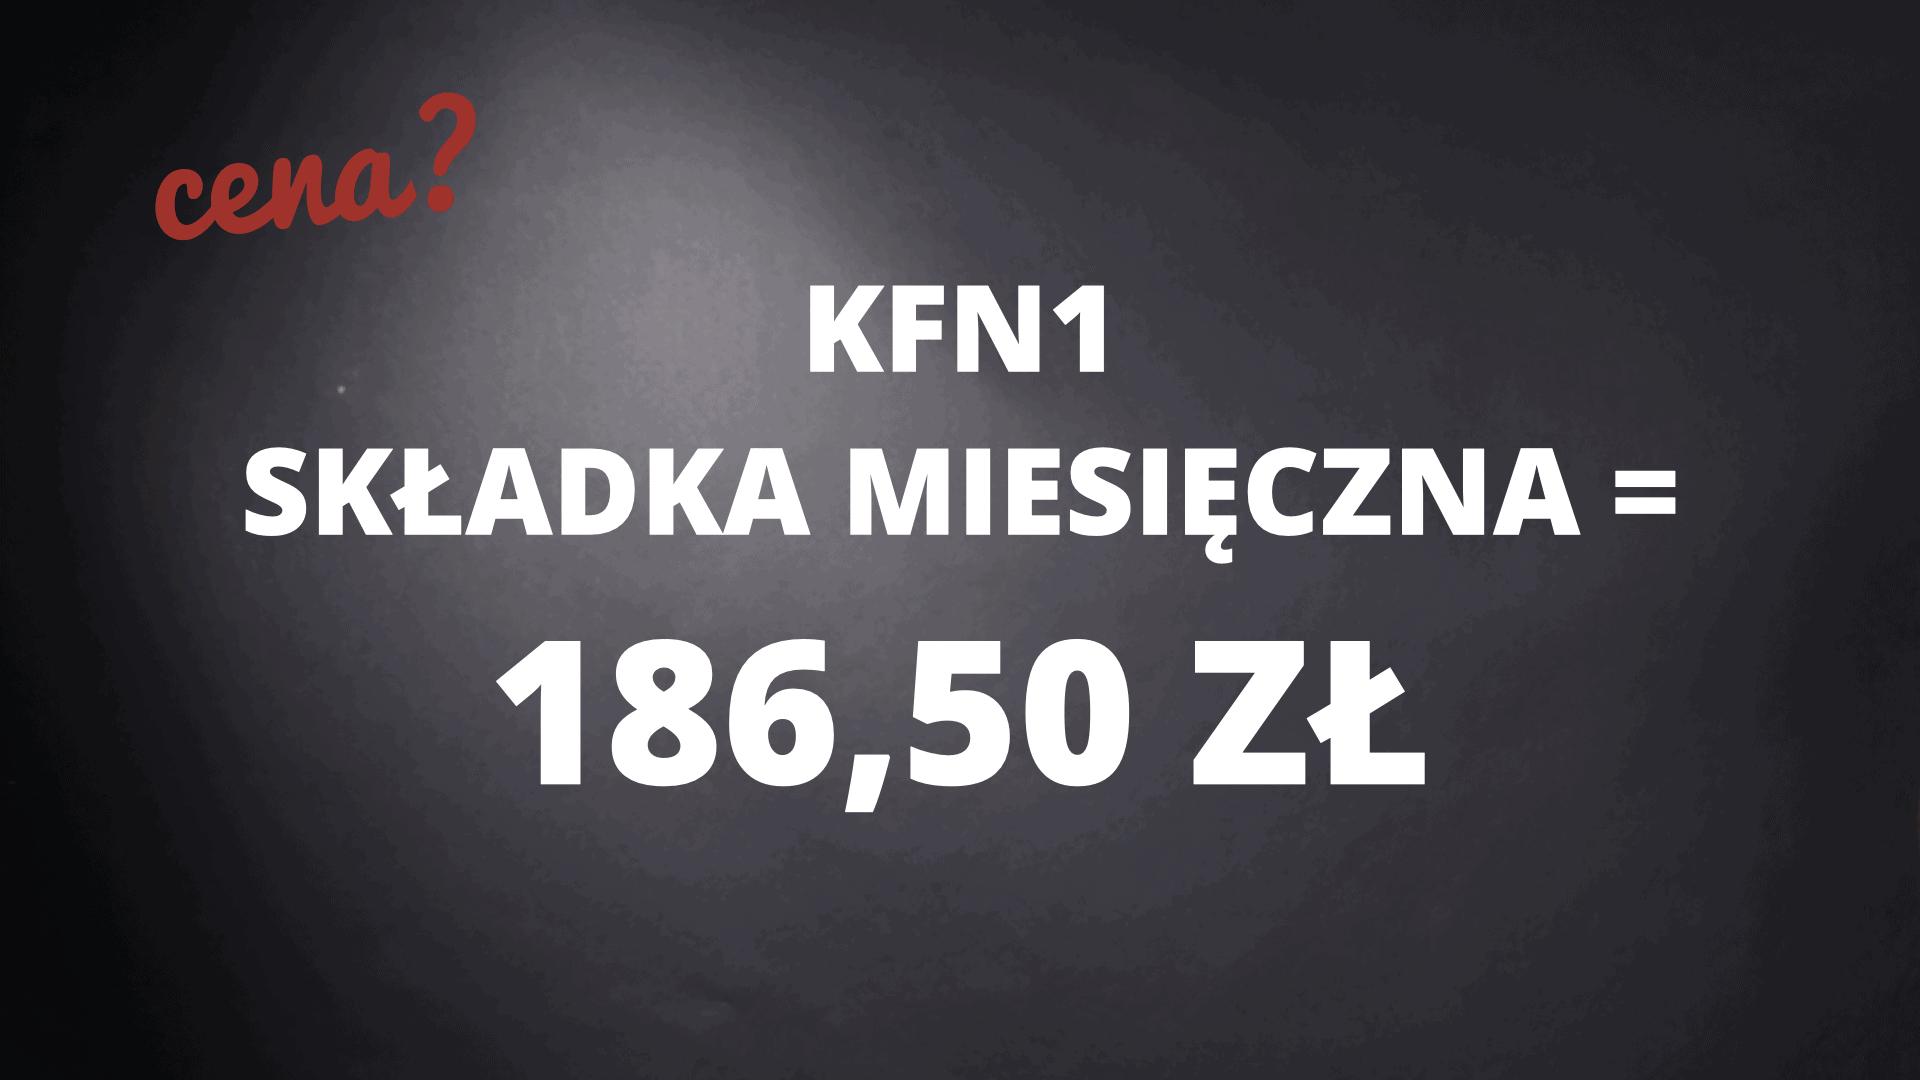 KFN1 składka miesięczna